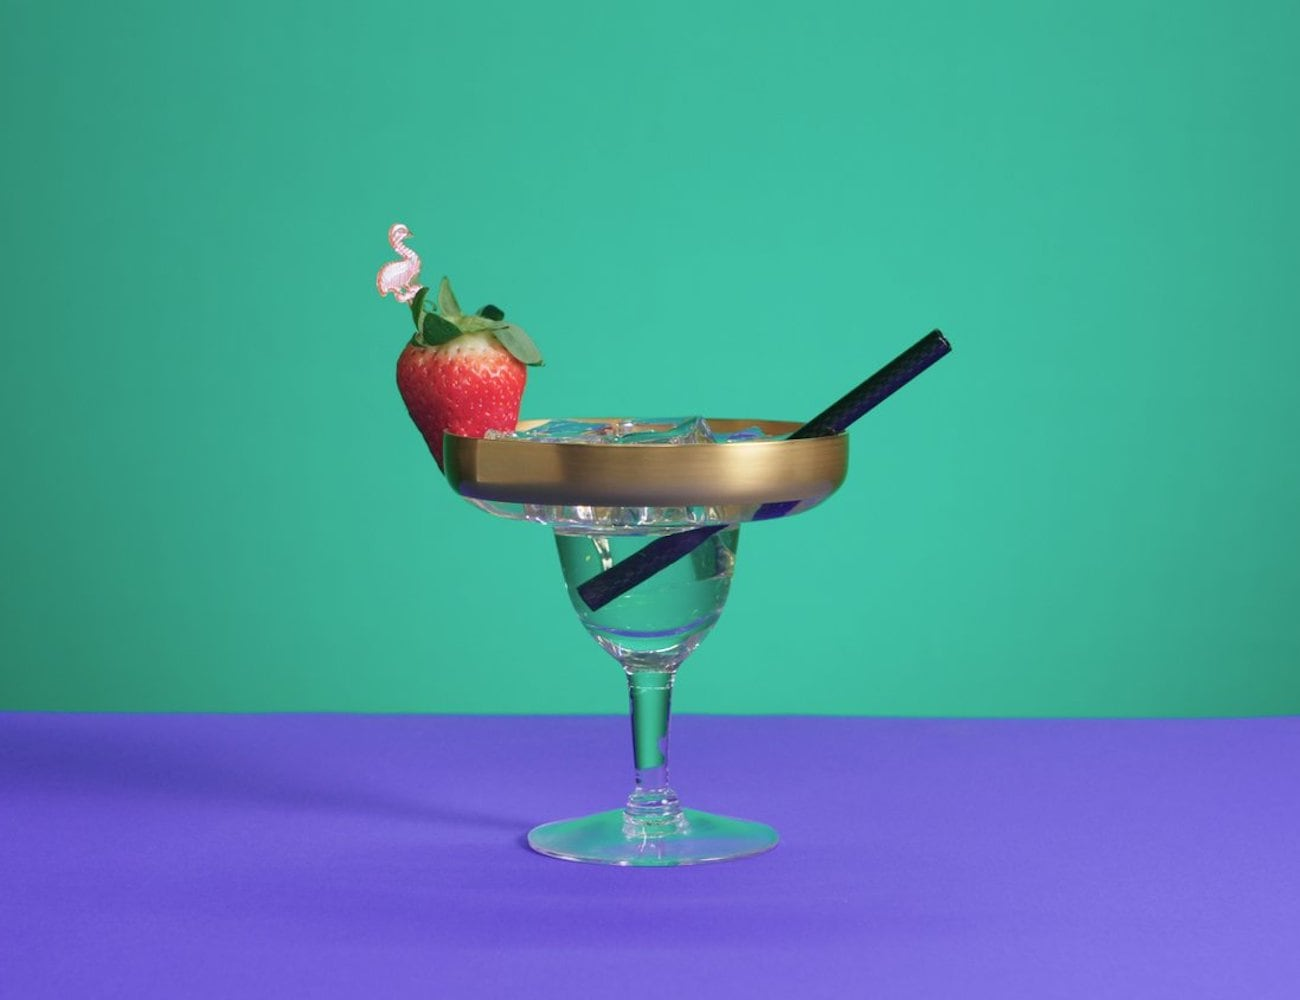 Lustir Carbon Fiber Drinking Straws are a stylish alternative to bendy straws